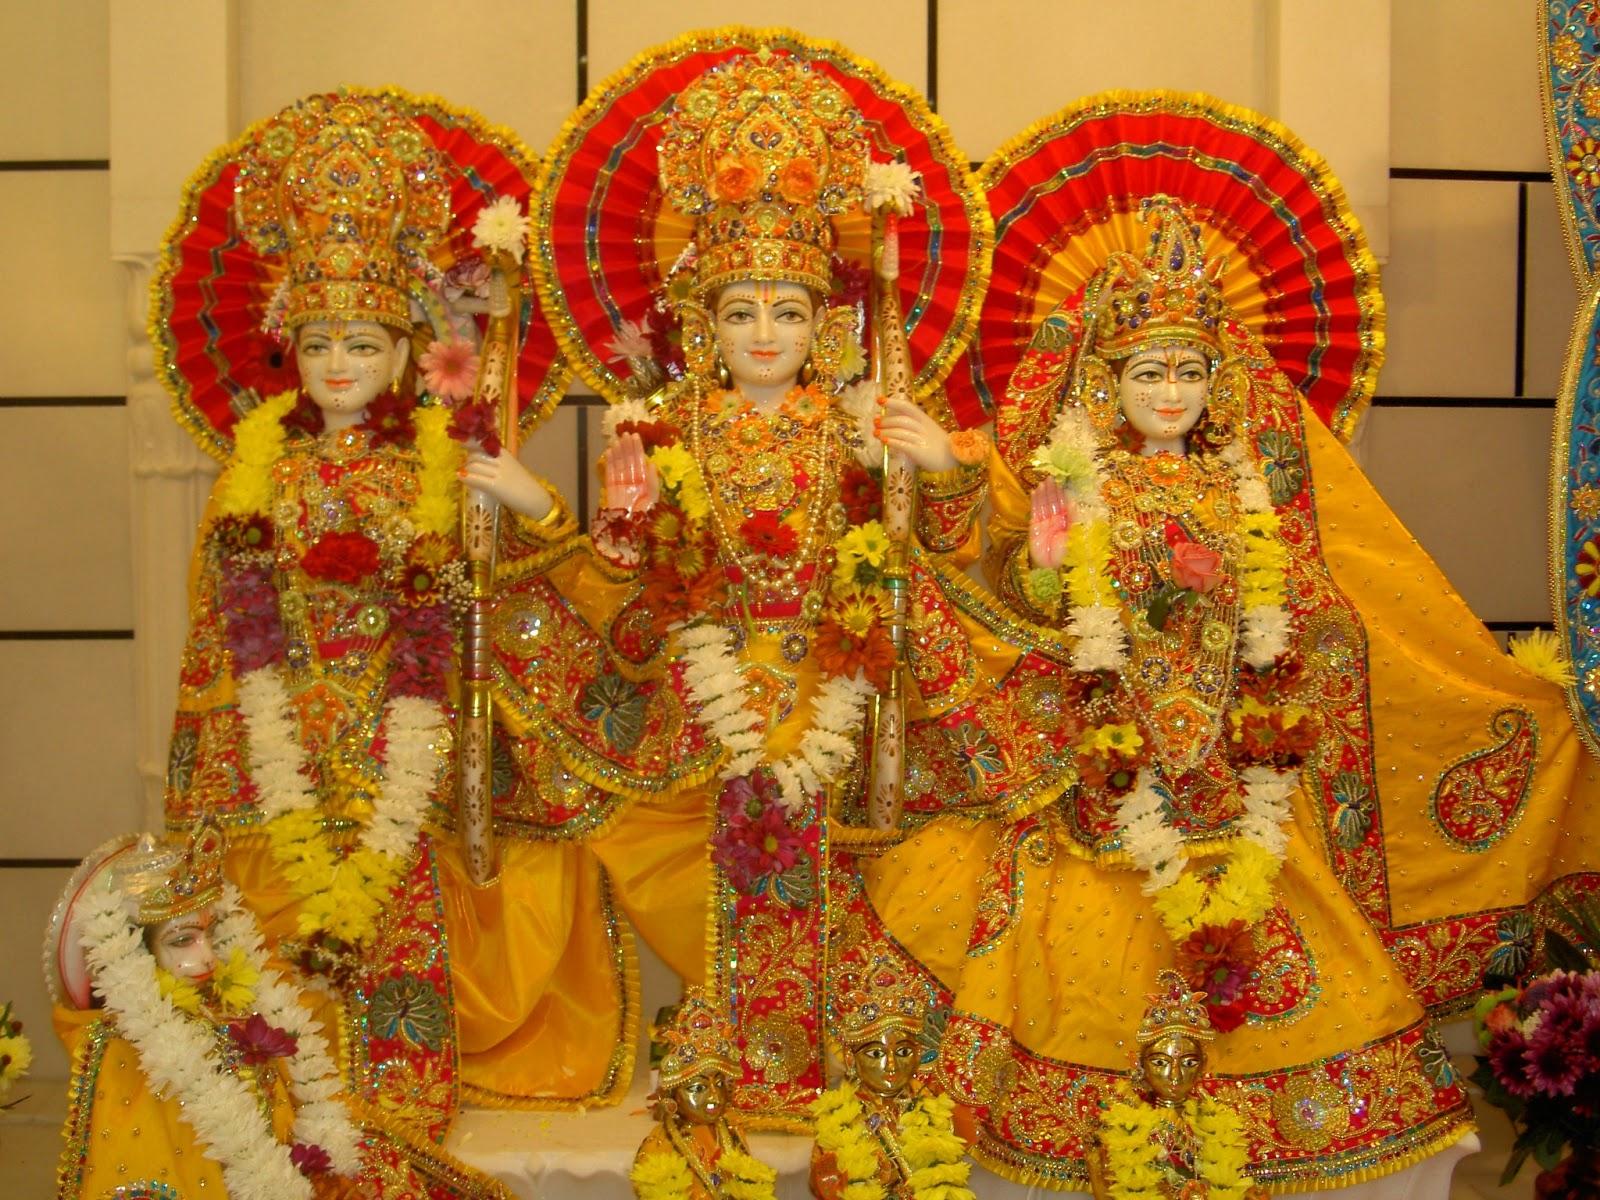 Free Download Wallpaper Hd Load Shri Ramgod Ram Sitaram Lakhan